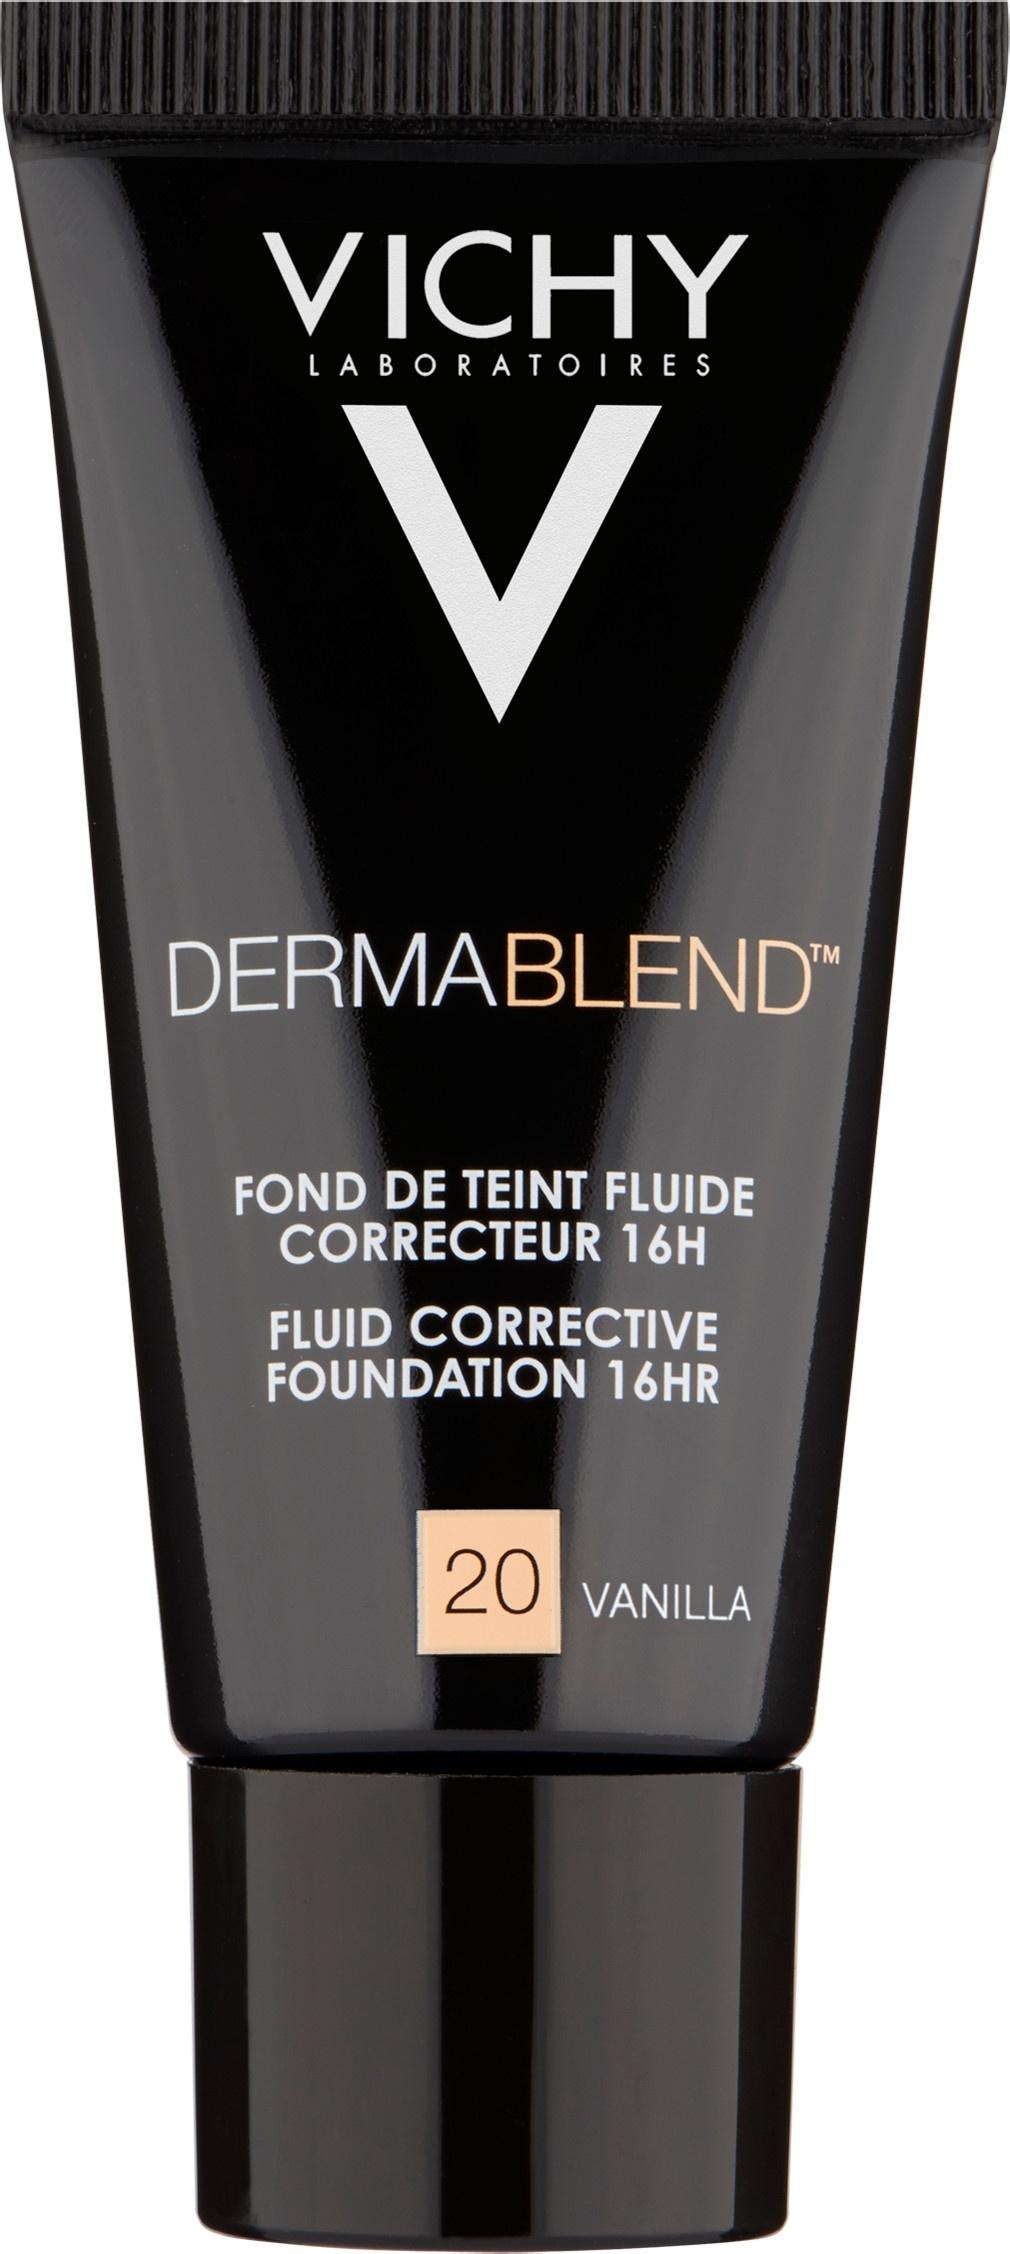 Vichy Dermablend Fluid Corrective Foundation Vanilla 20 30ml